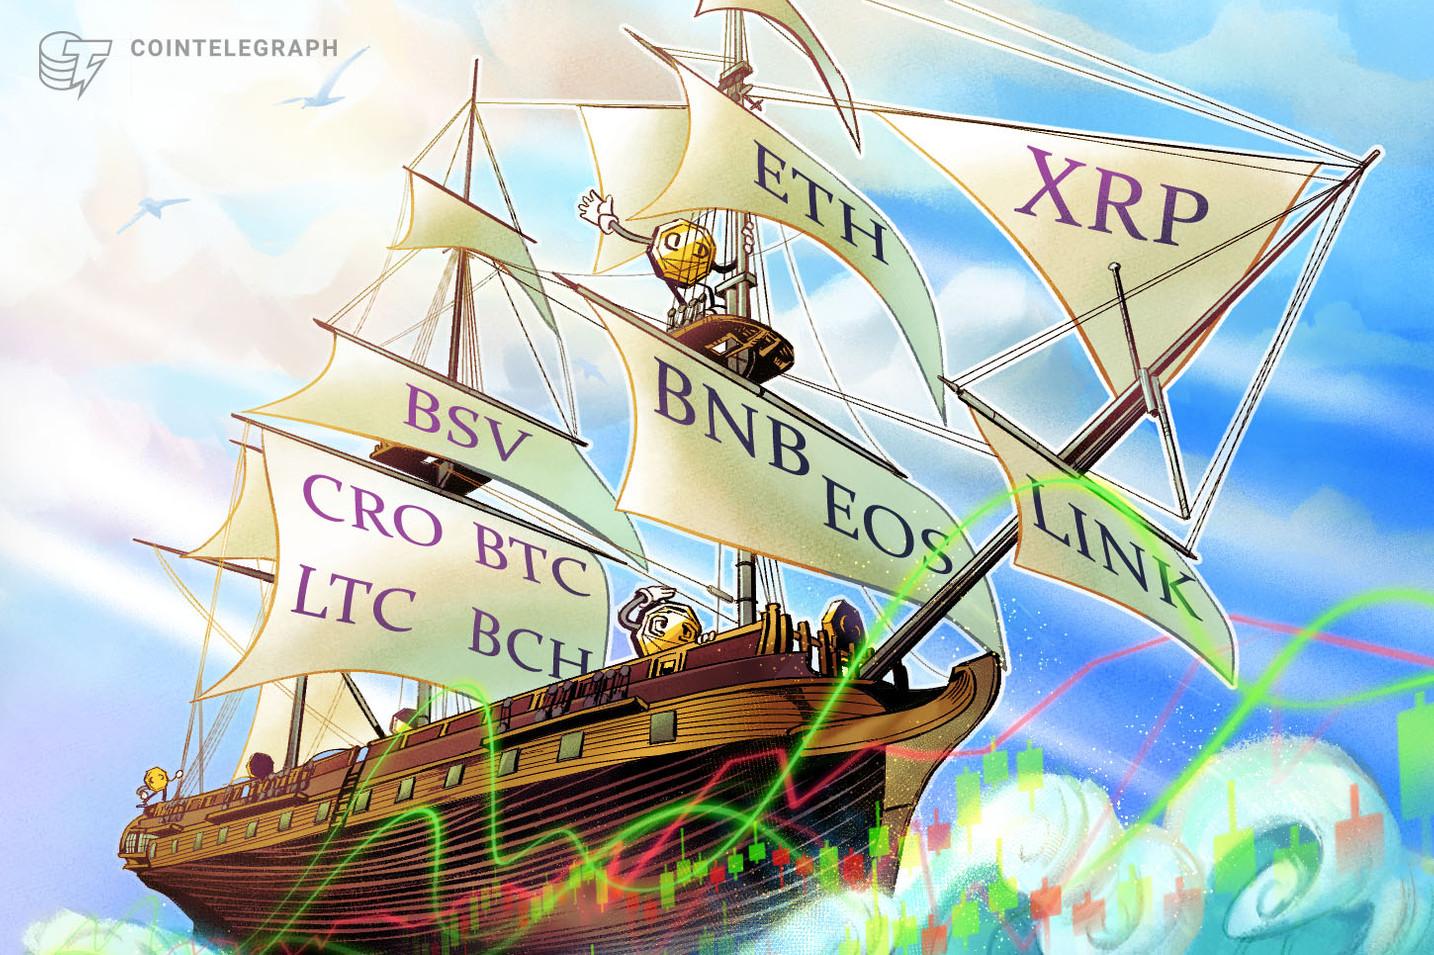 Price analysis 8/31: BTC, ETH, XRP, LINK, BCH, LTC, BSV, CRO, BNB, EOS